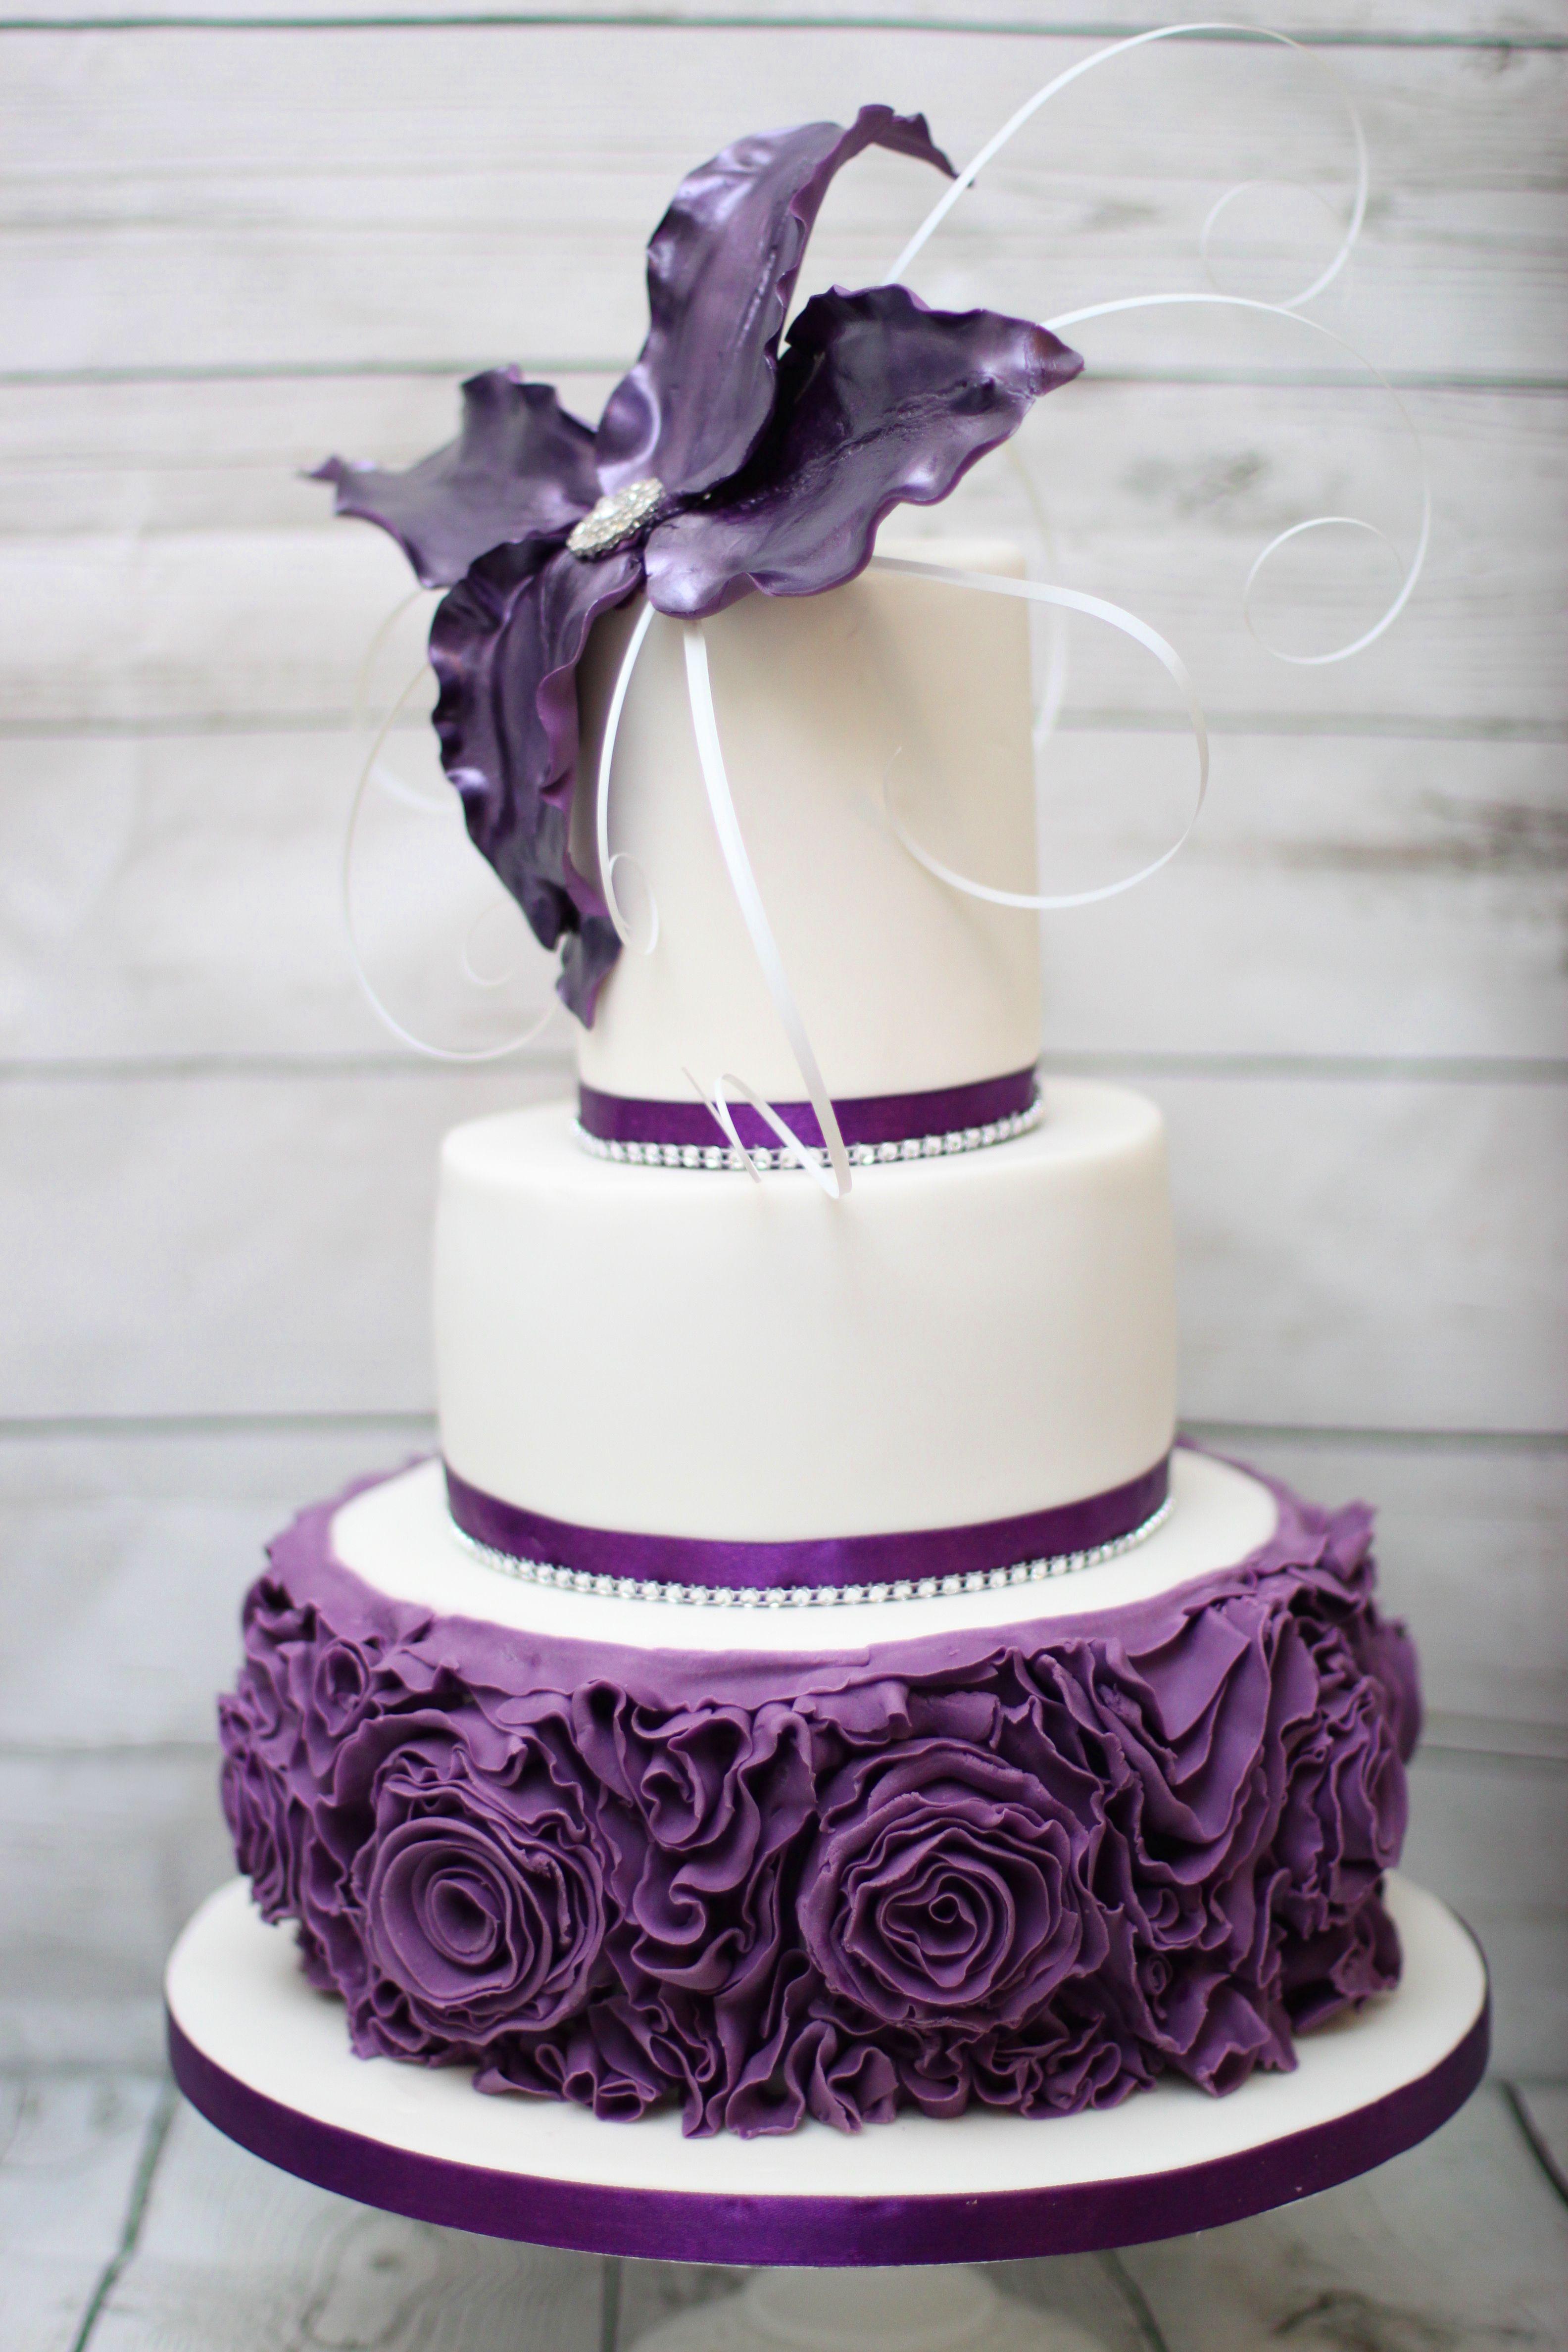 3 Tier cadburys purple birthday cake Ruffle roses and wired flower